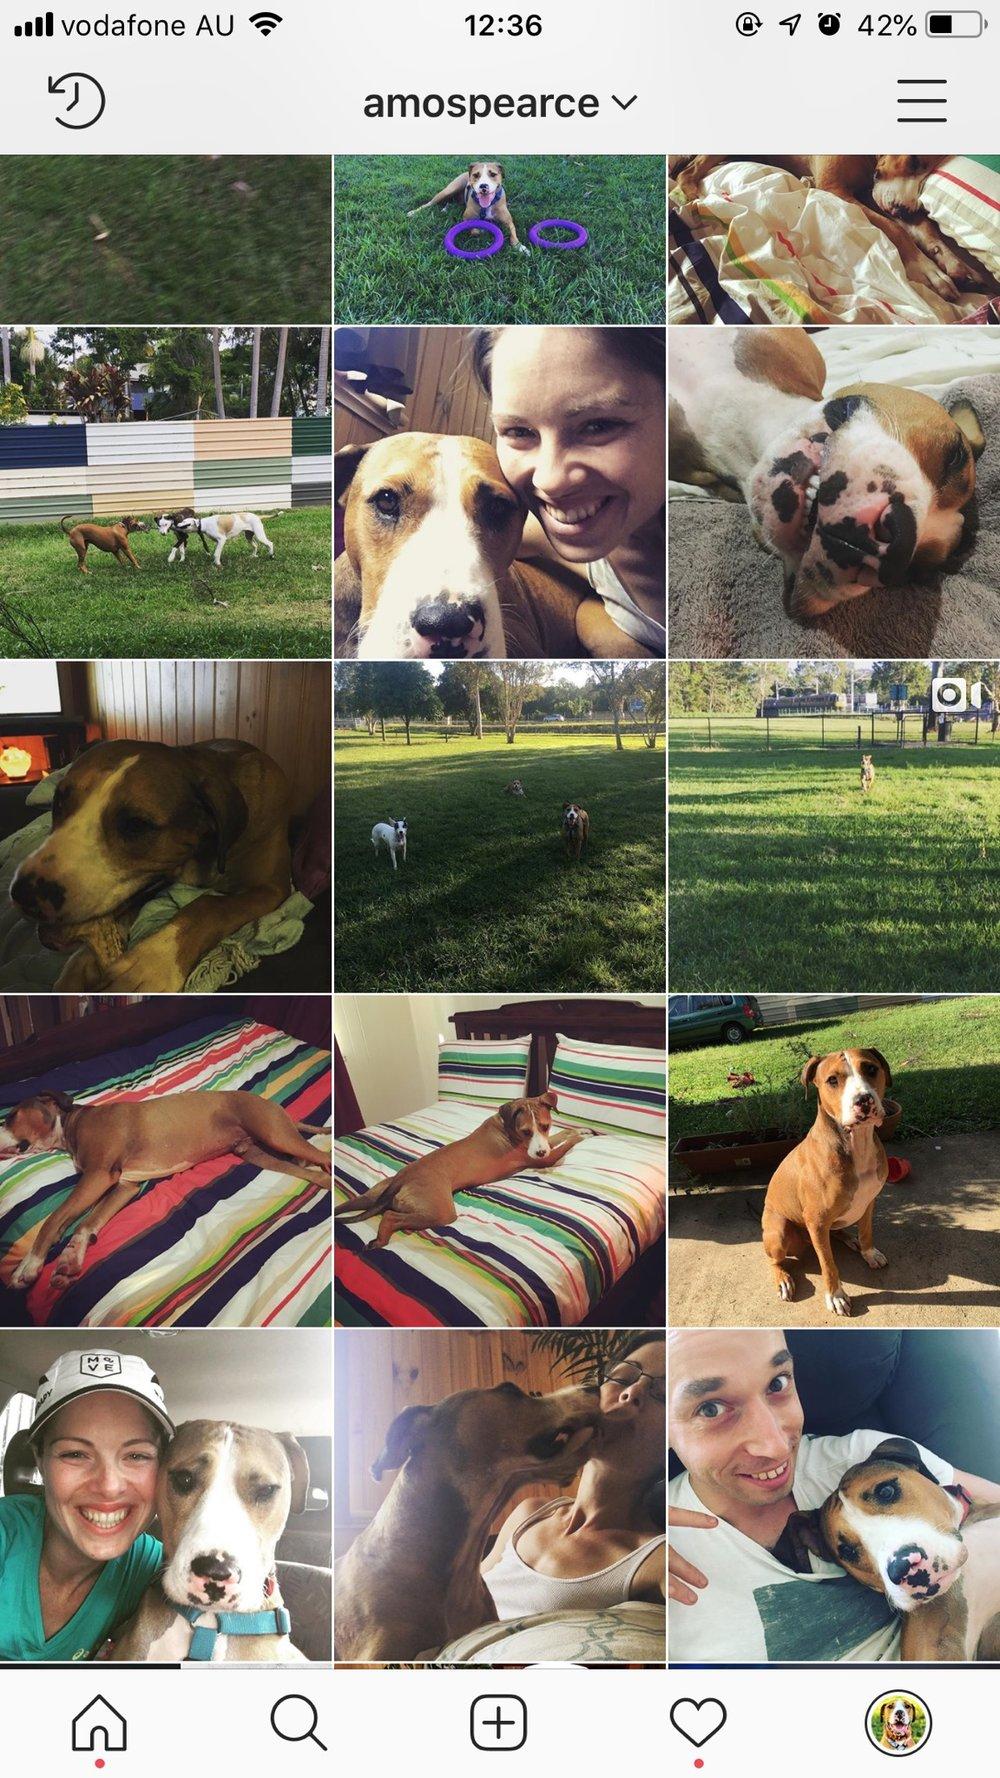 Instagram Feed mid 2016